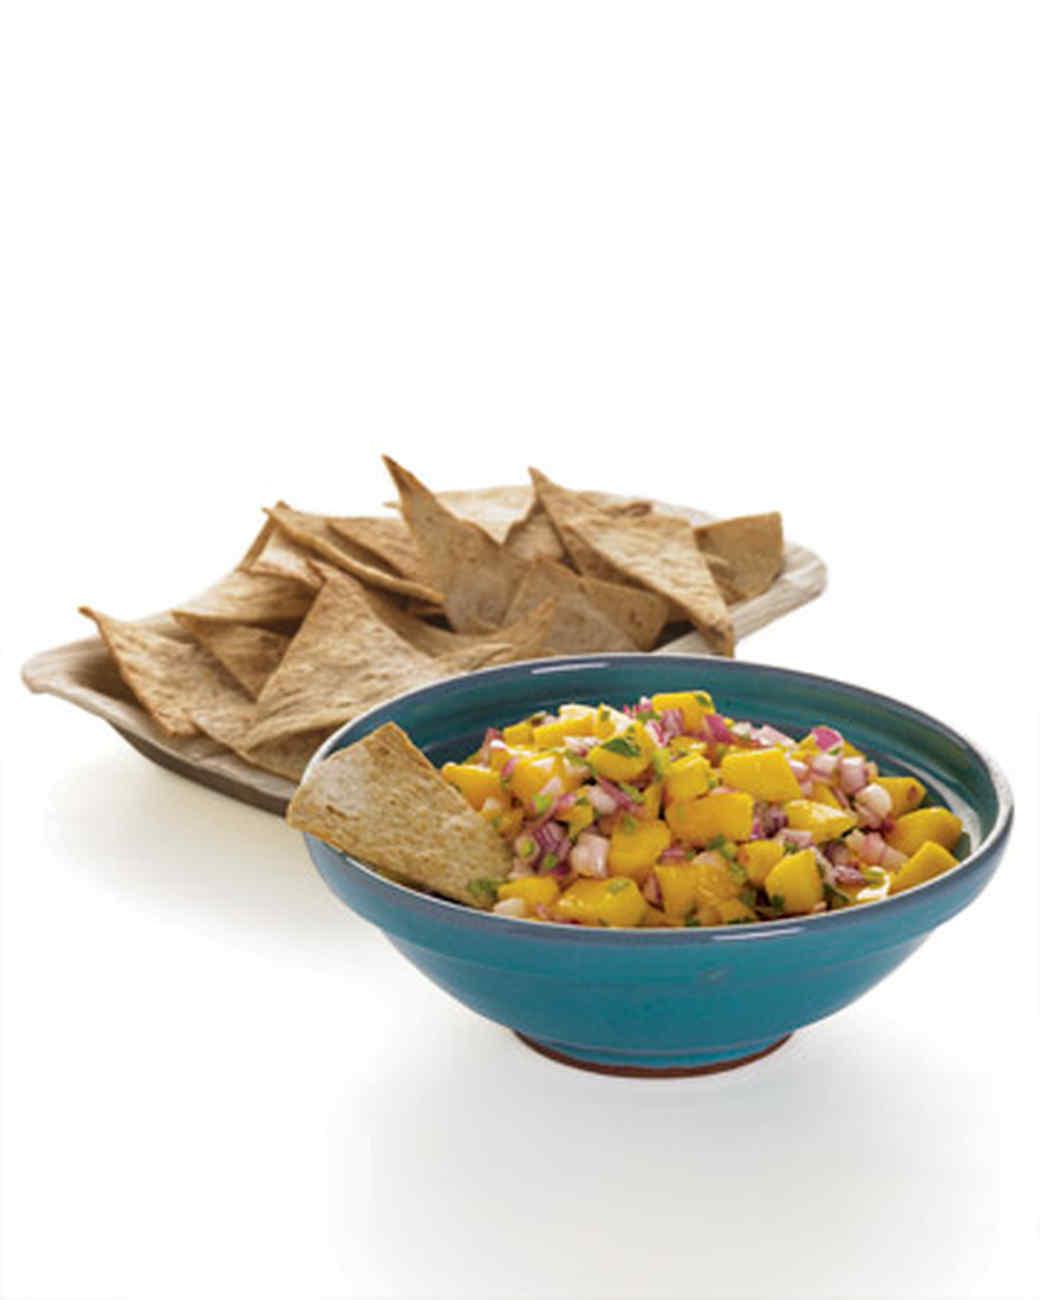 bd104026_0908_mango_salsa.jpg